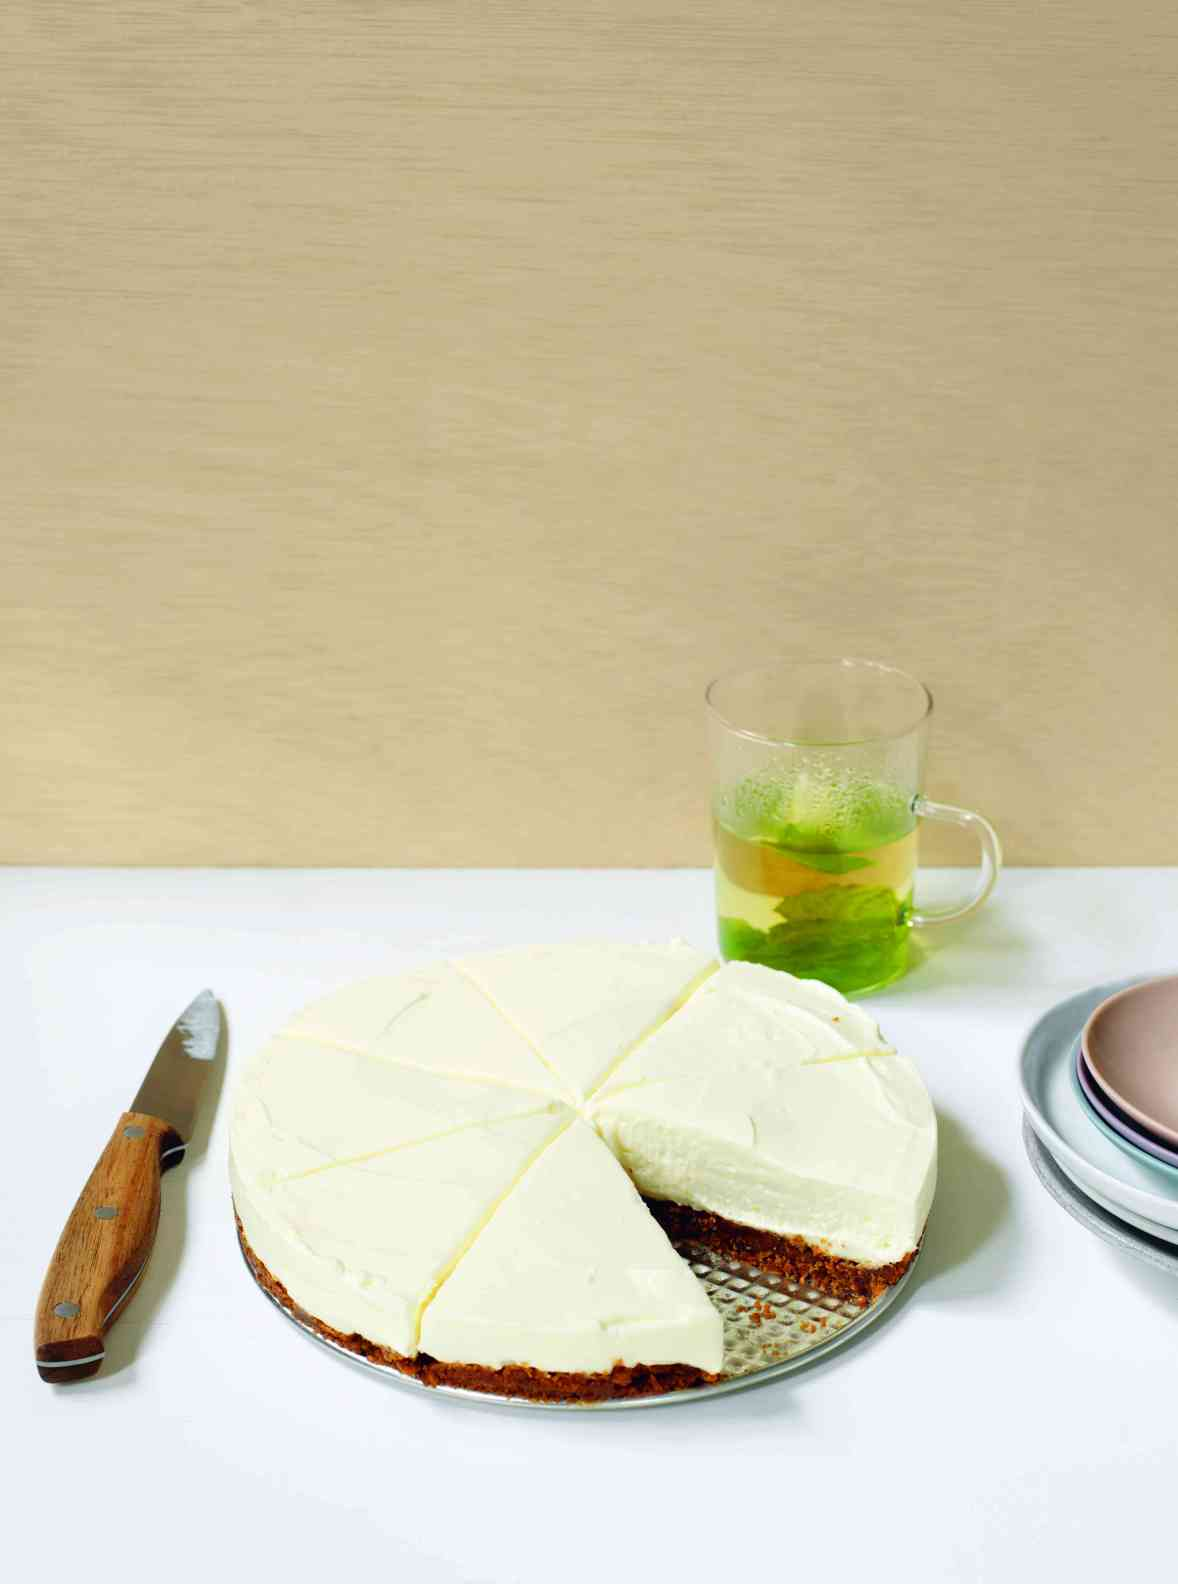 Cheesecake, Fotografie © Deirdre Rooney, AT Verlag / www.at-verlag.ch